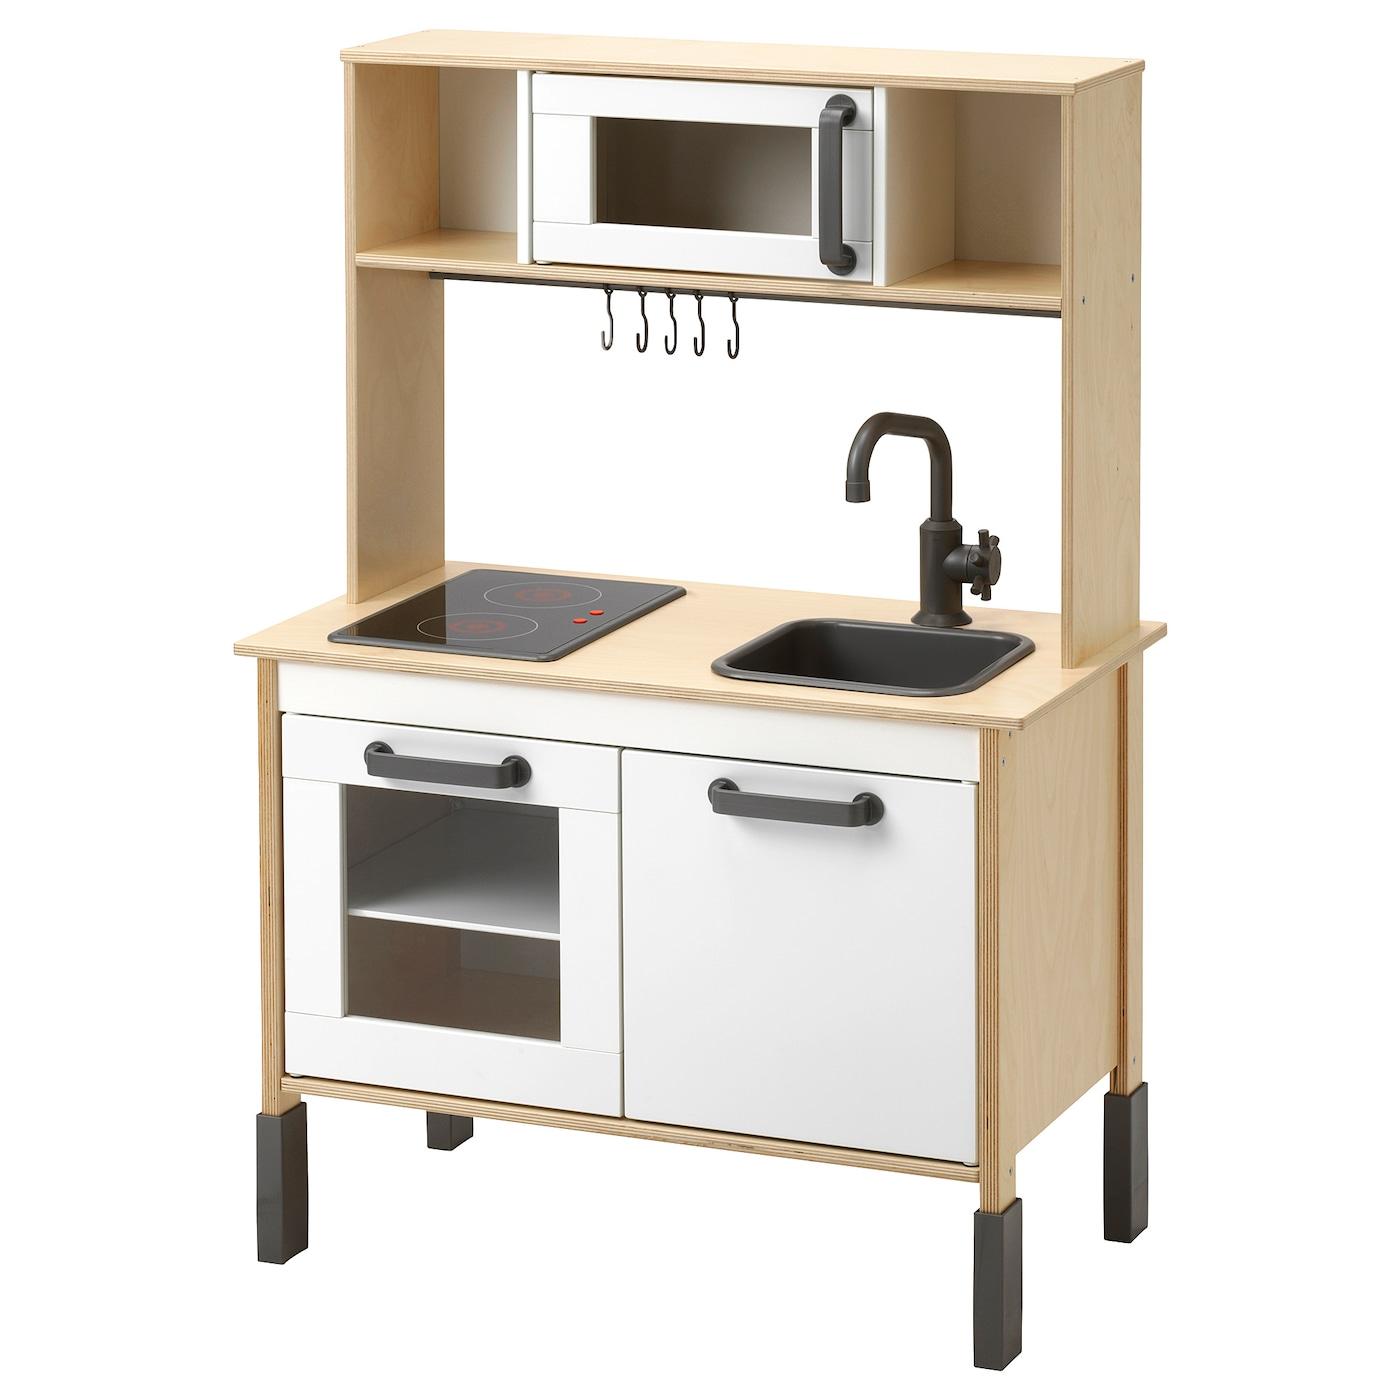 Duktig Birch Play Kitchen 72x40x109 Cm Ikea